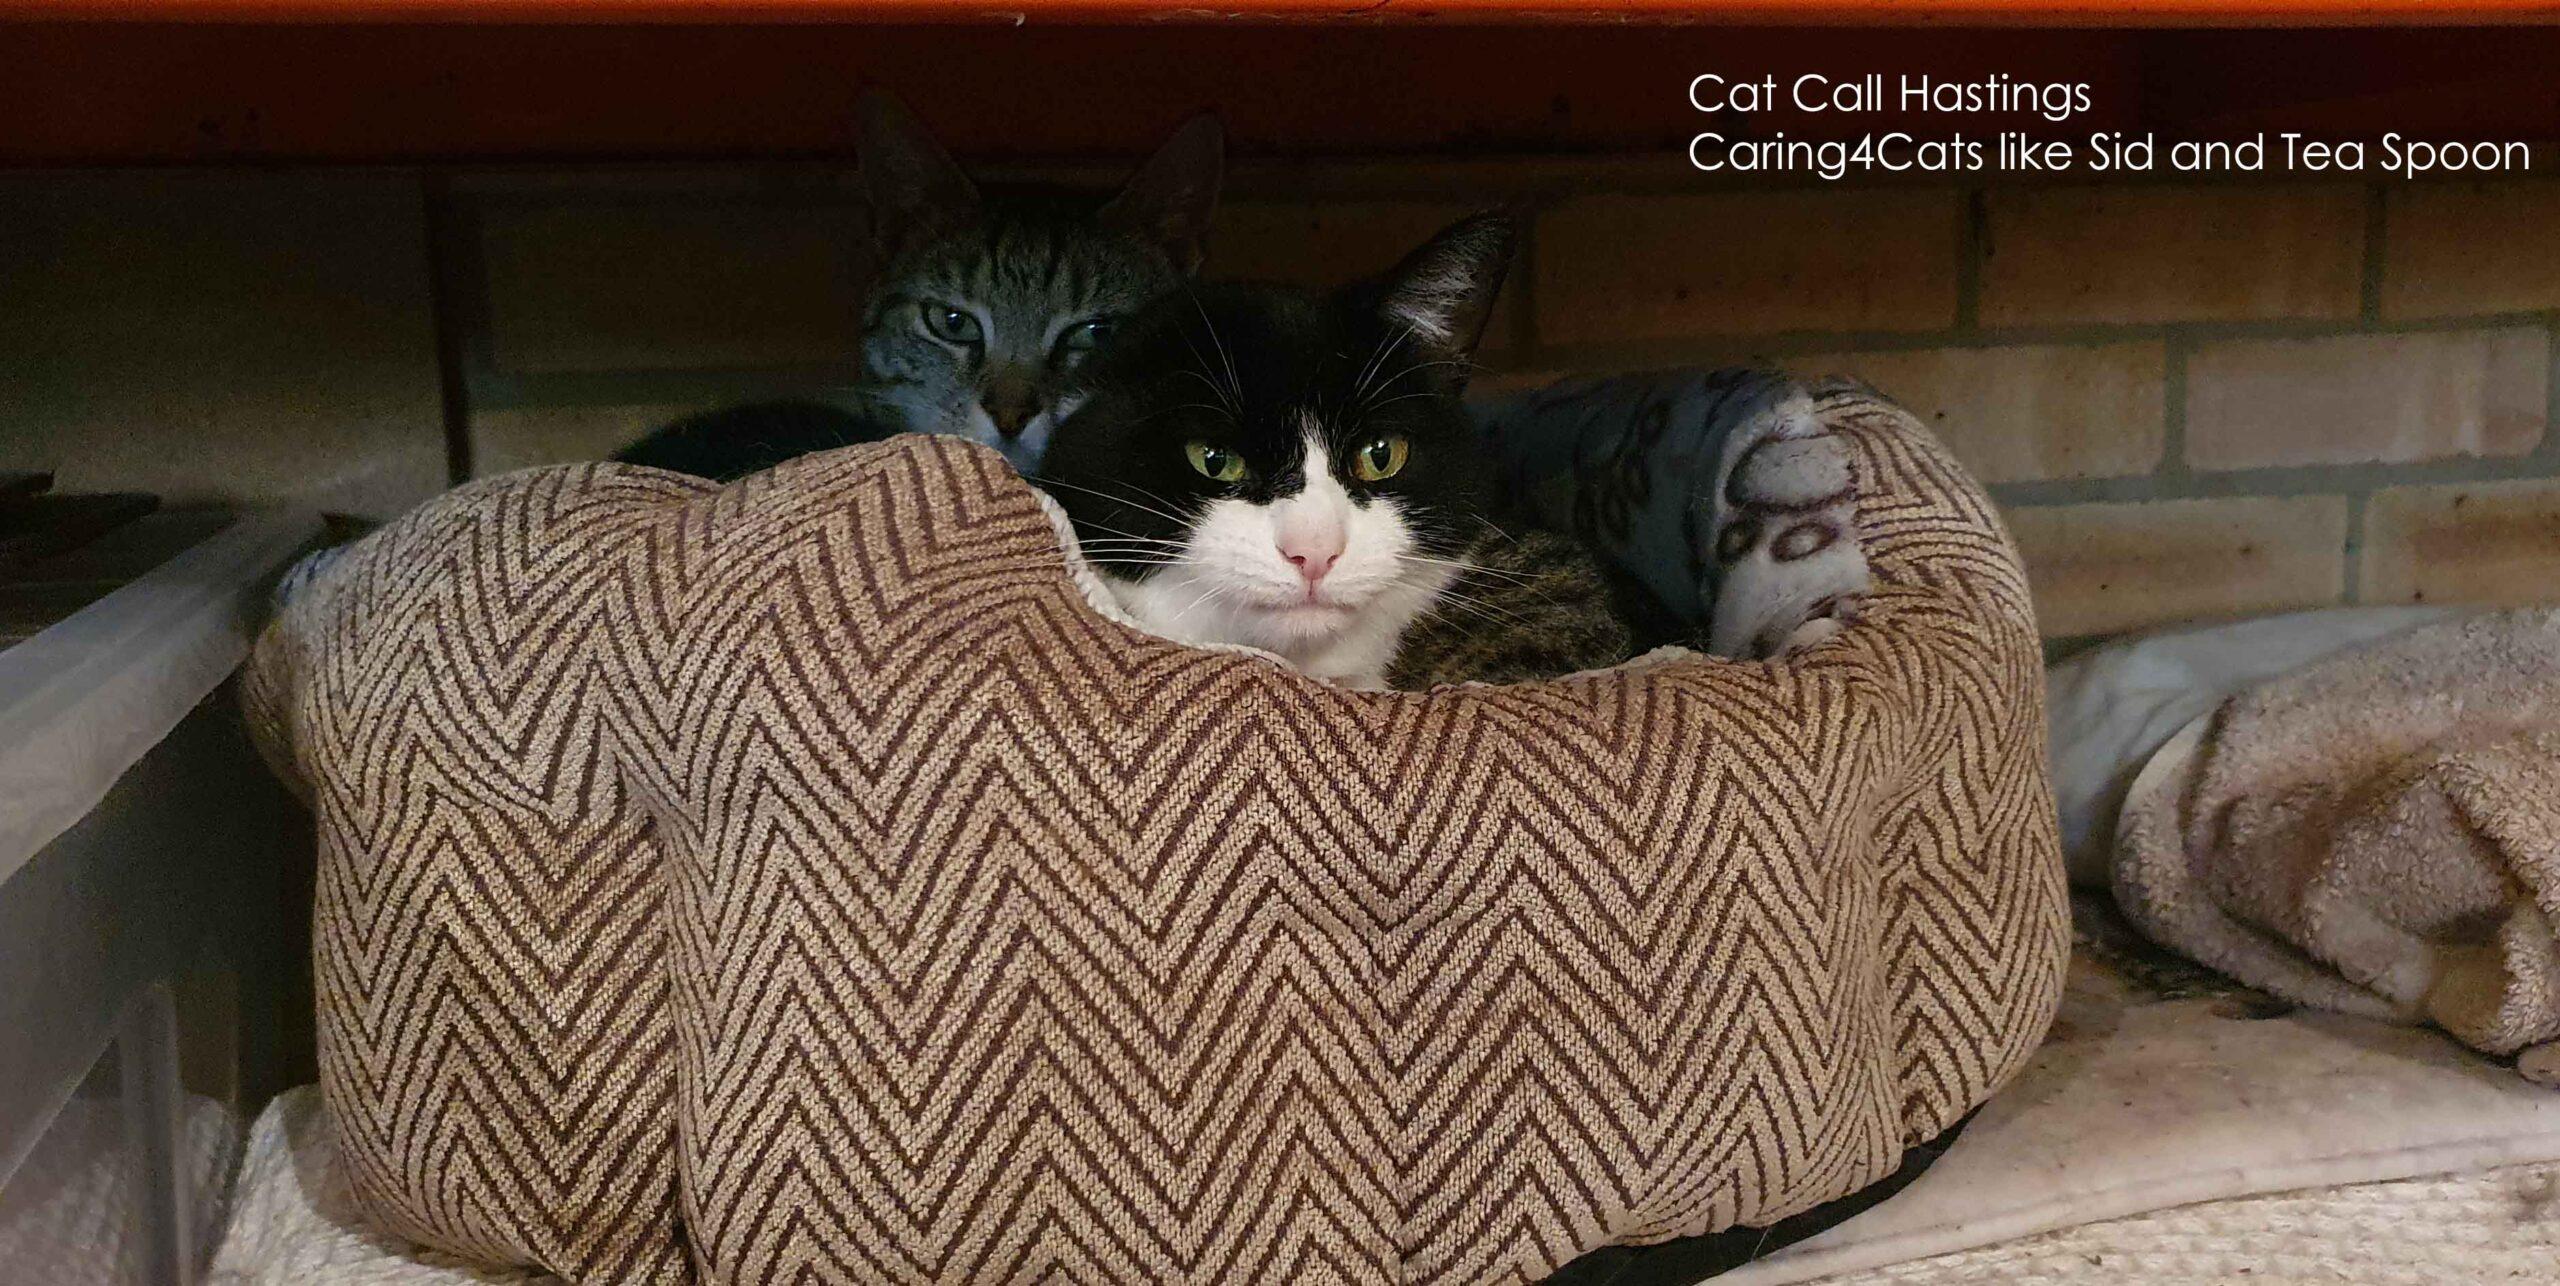 Cat charity in Hastings